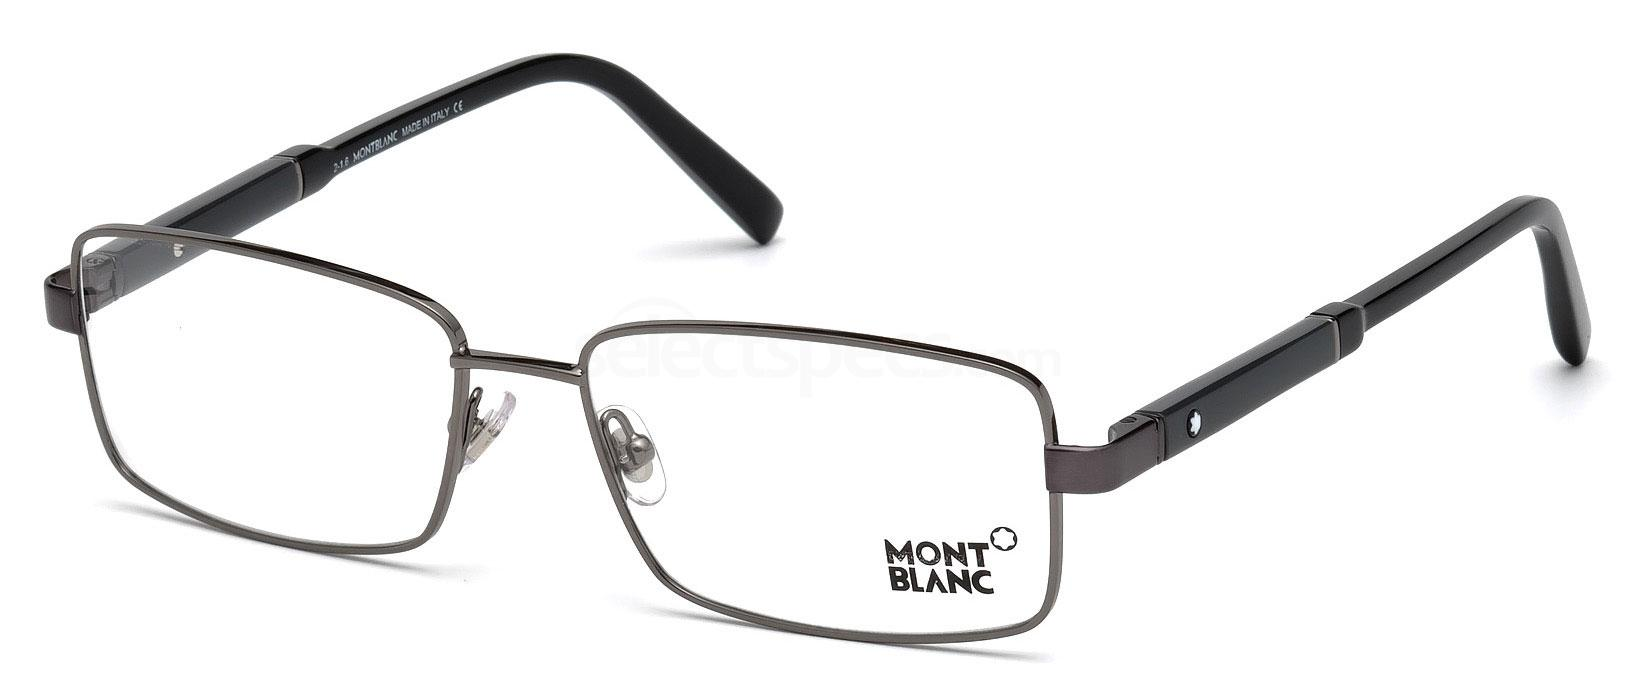 008 MB0640 , Mont Blanc